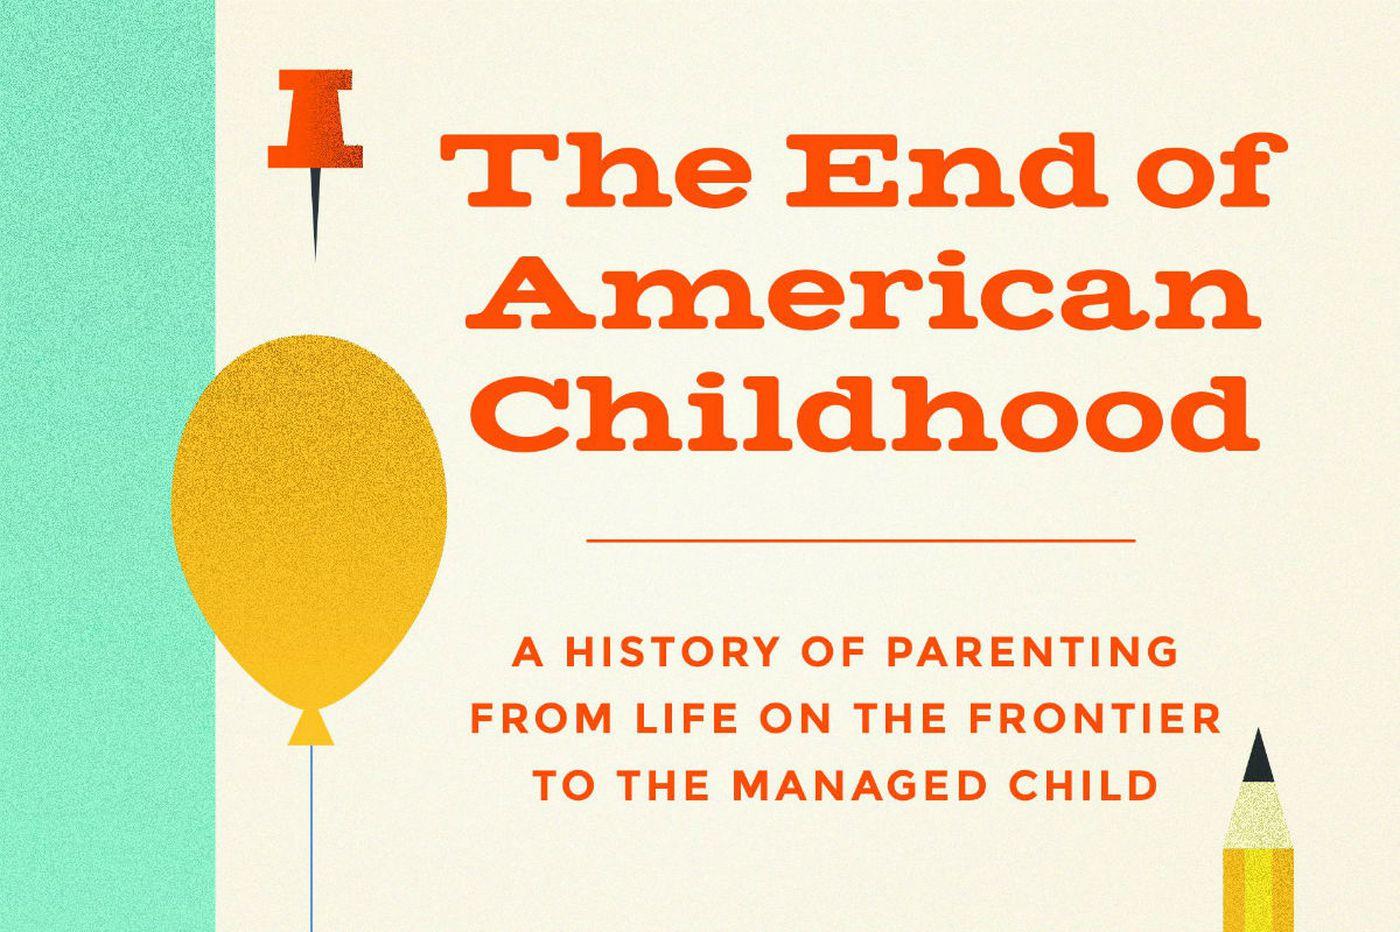 'End of American Childhood': Beginning of American parenthood